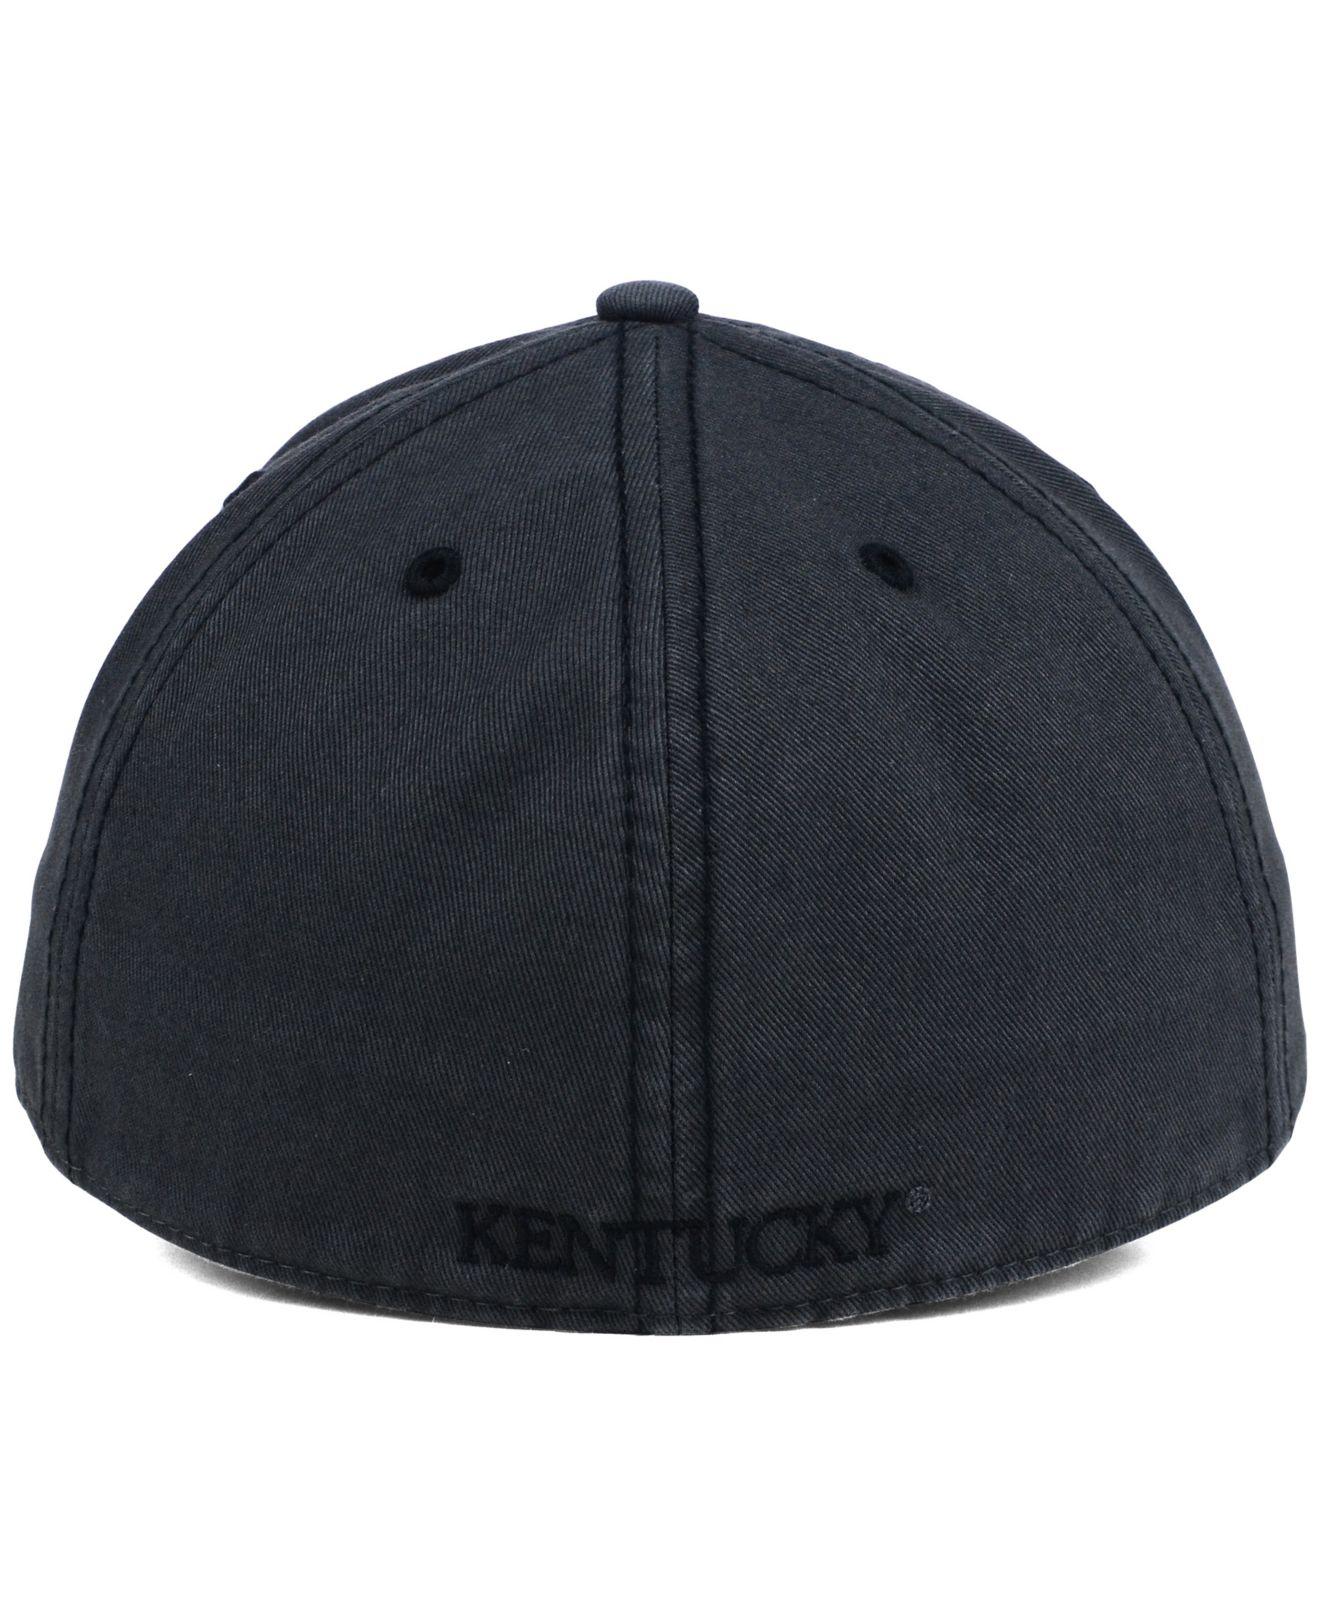 Lyst - 47 Brand Kentucky Wildcats Sachem Cap in Gray for Men d4838f1f49f9